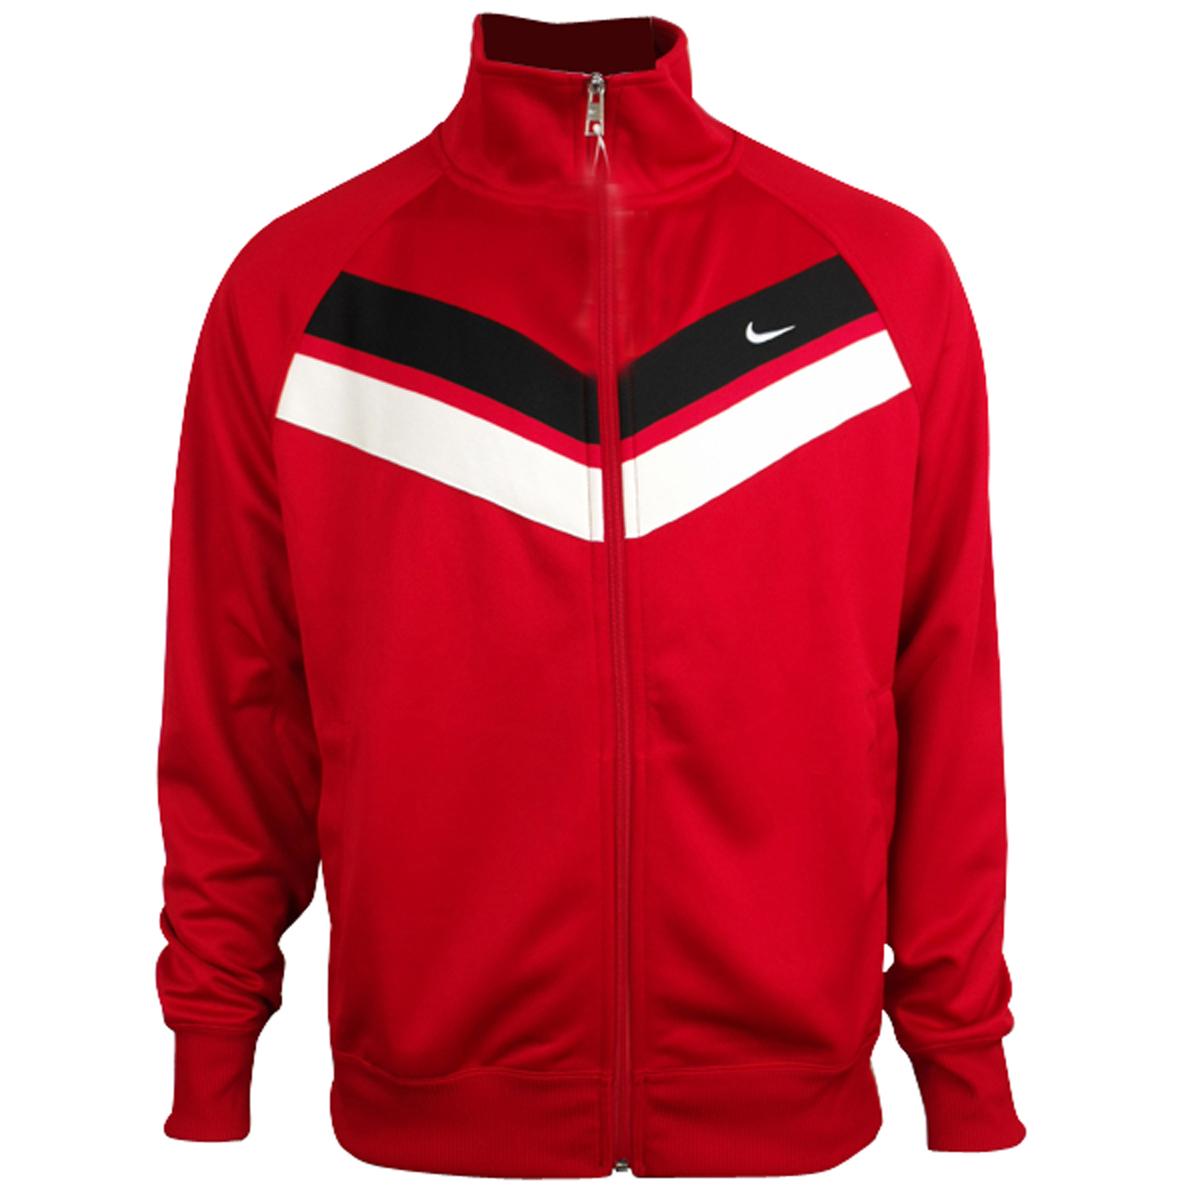 nike mens jacket retro polyester vintage track suit